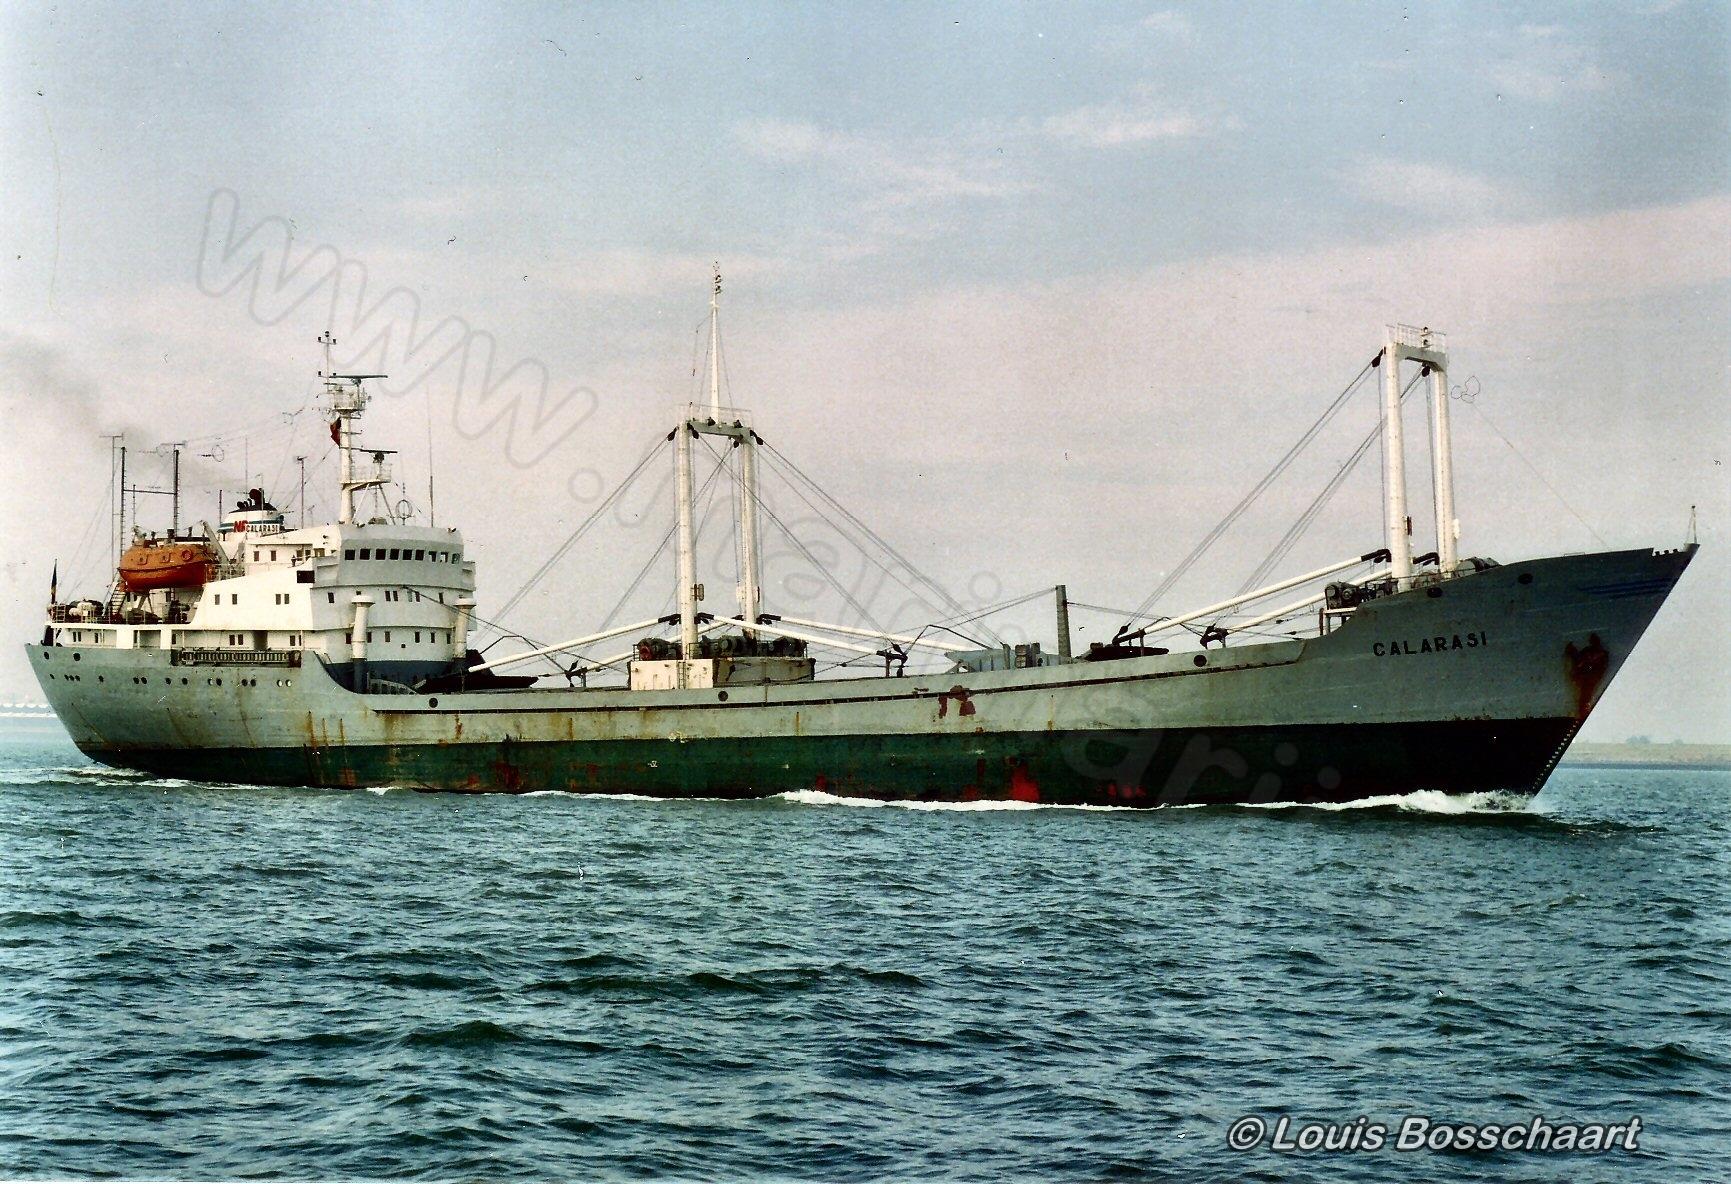 Navrom-cargoul-Calarasi-Louis_Bosschaart